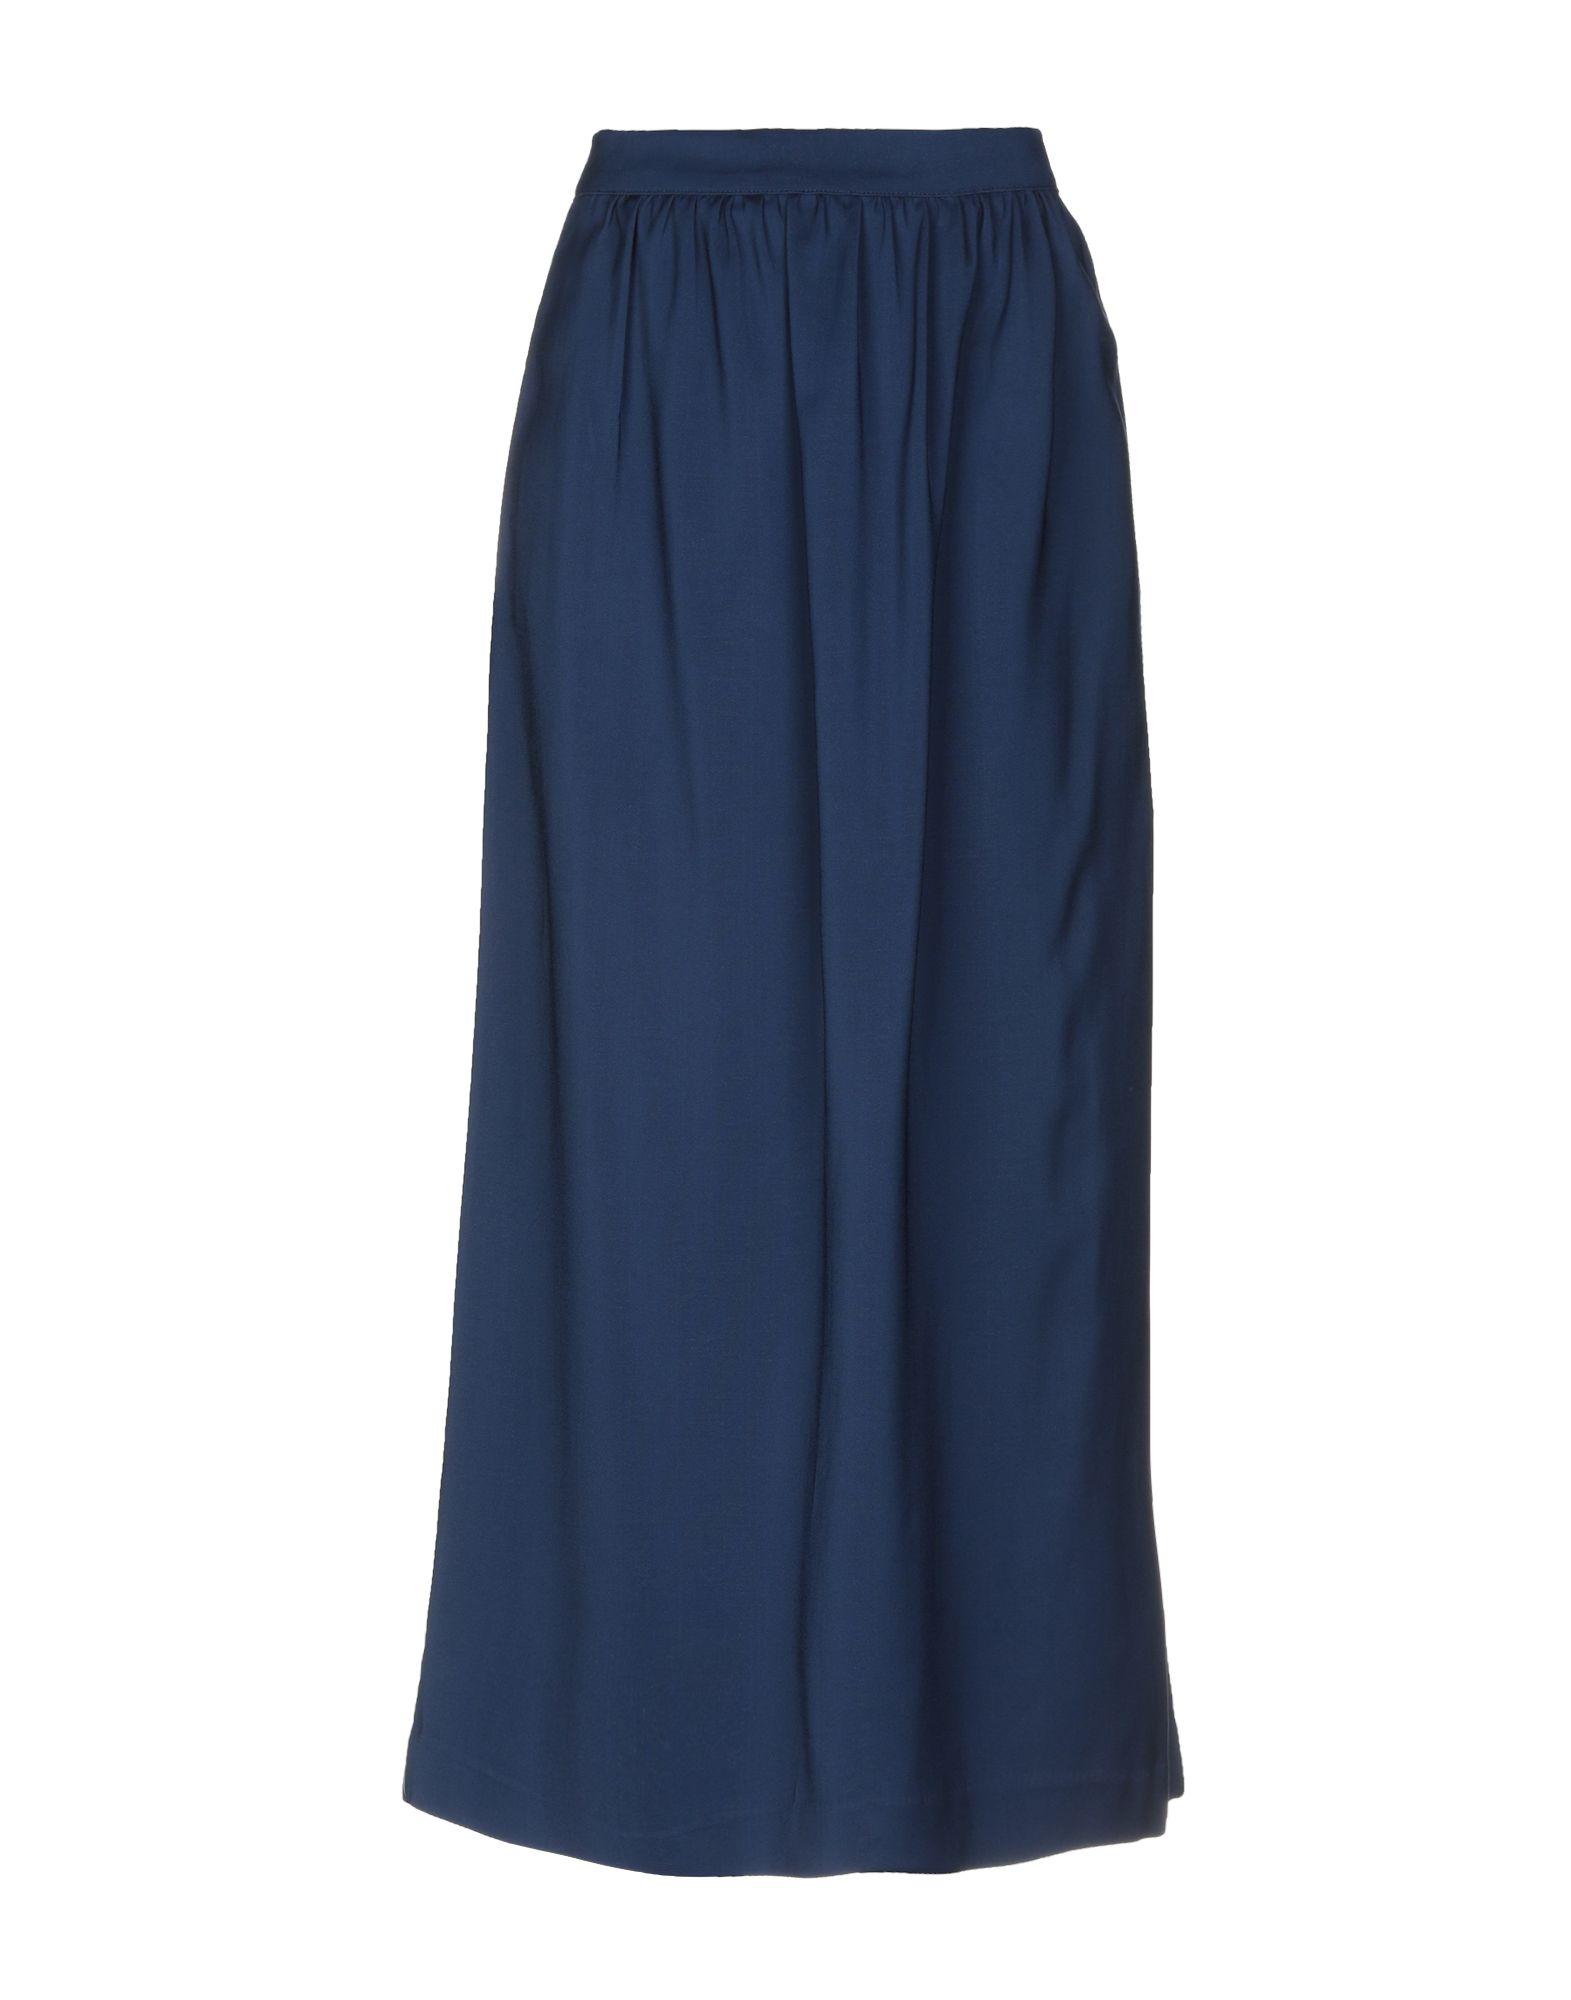 GOLDEN GOOSE DELUXE BRAND Длинная юбка цена и фото